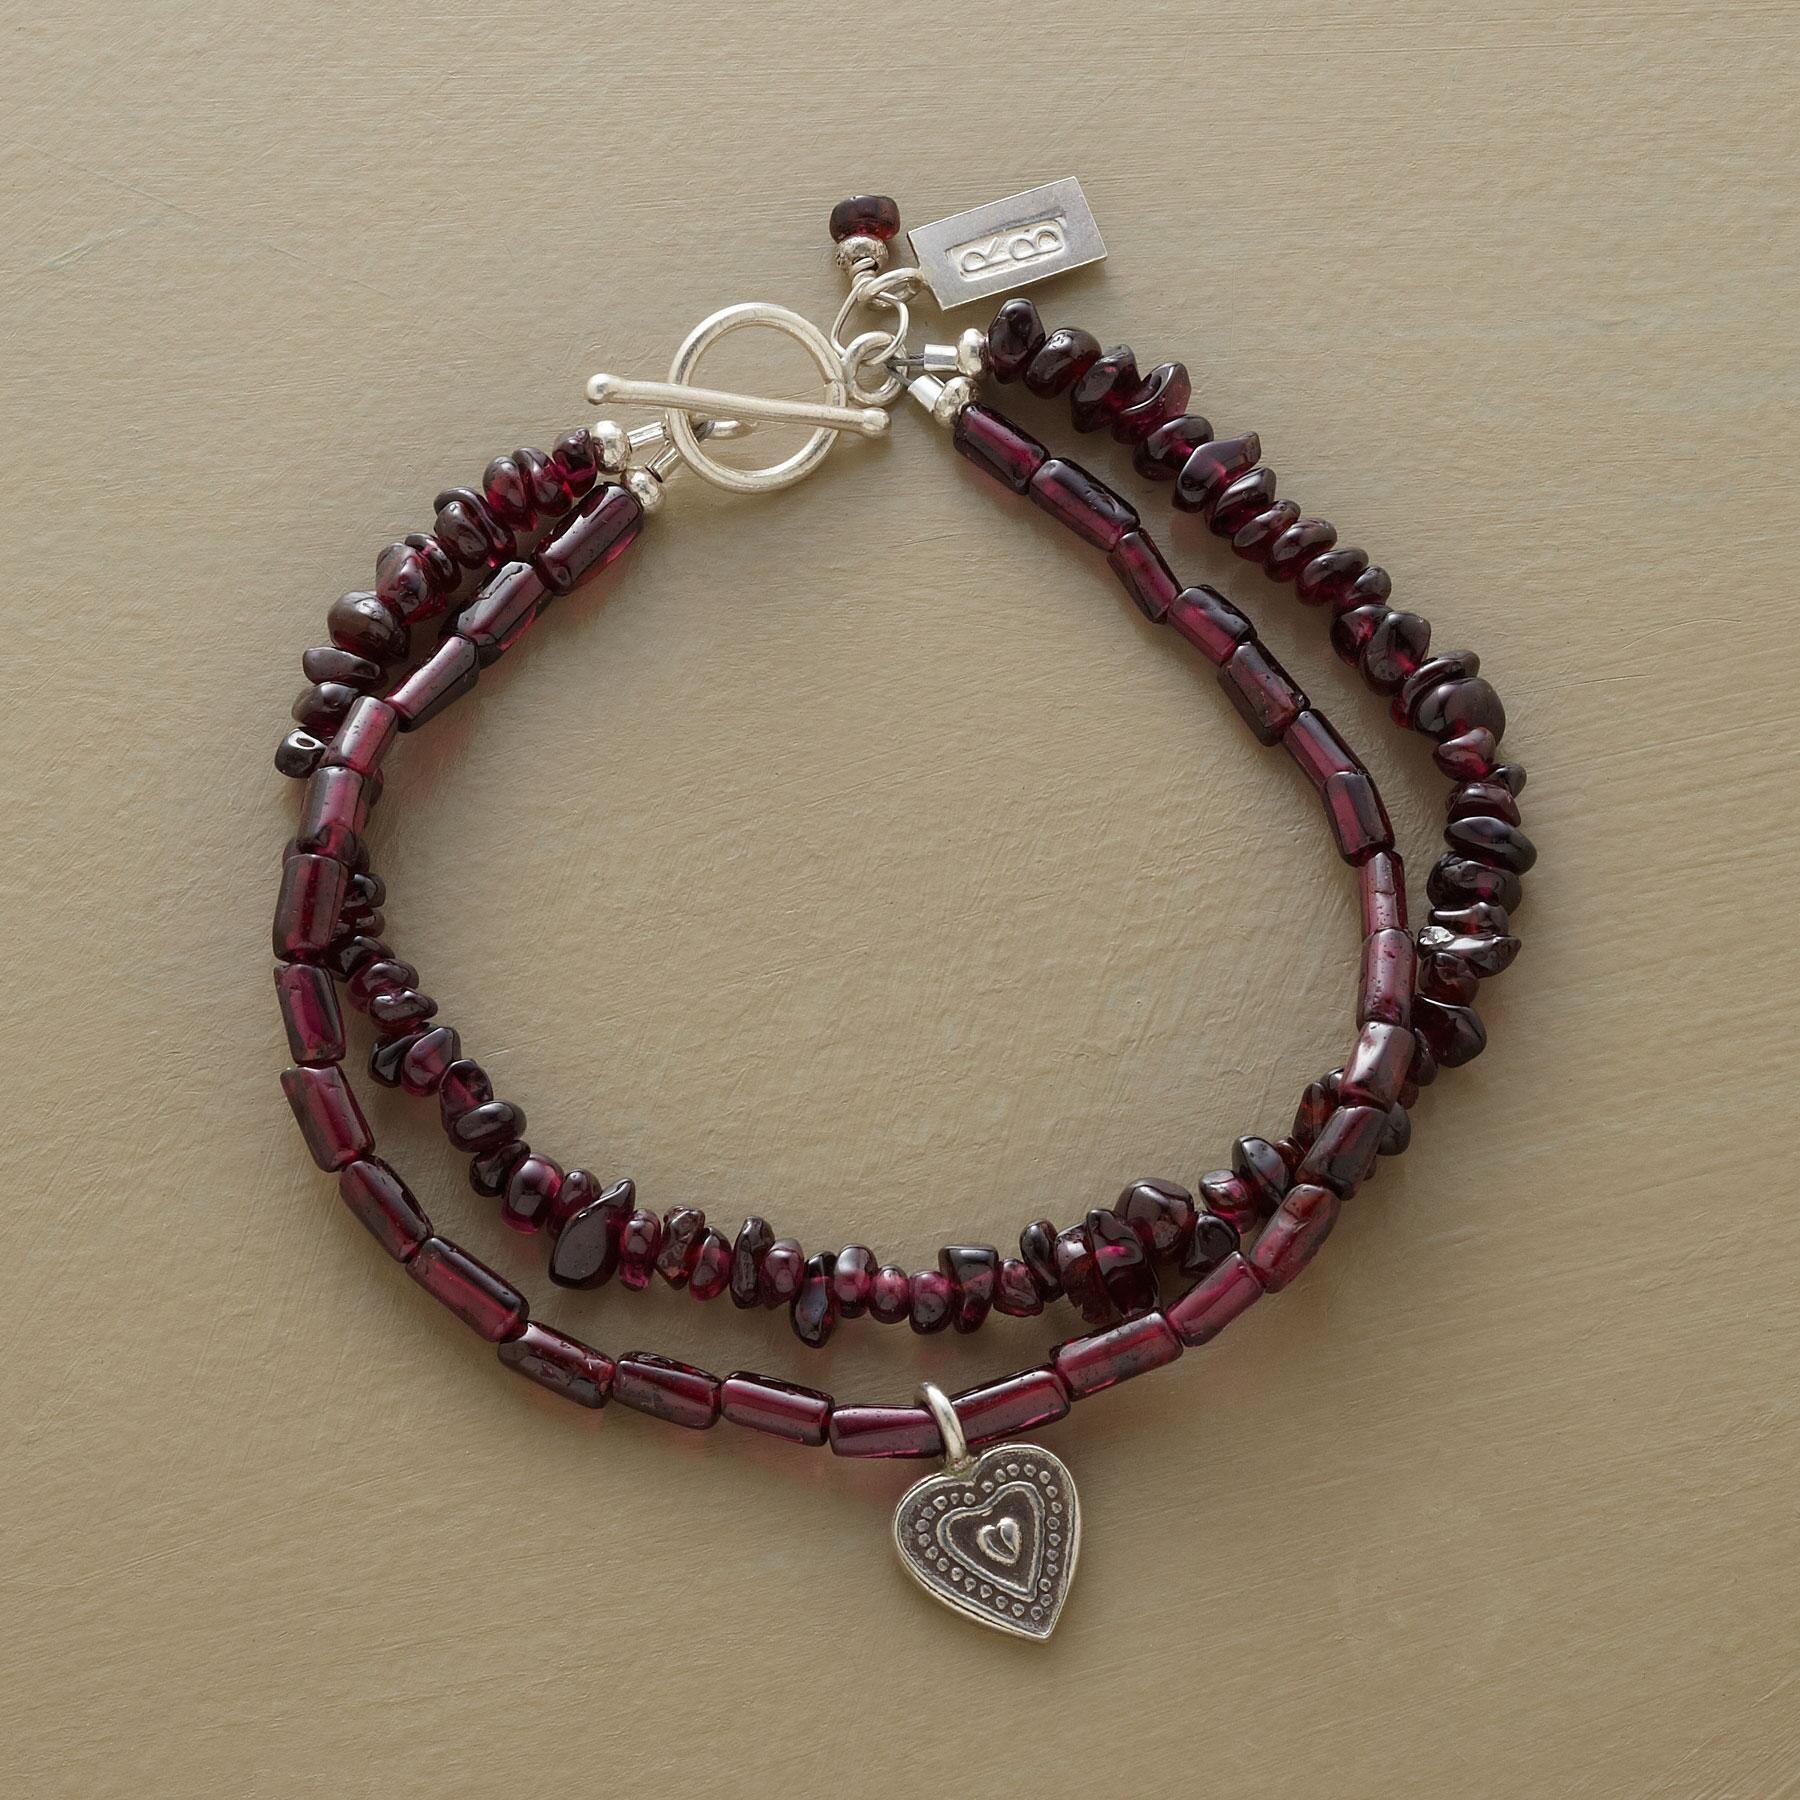 Unique Jewelry: DOUBLE GARNET BRACELET -- Garnets Two Ways: One Strand Of